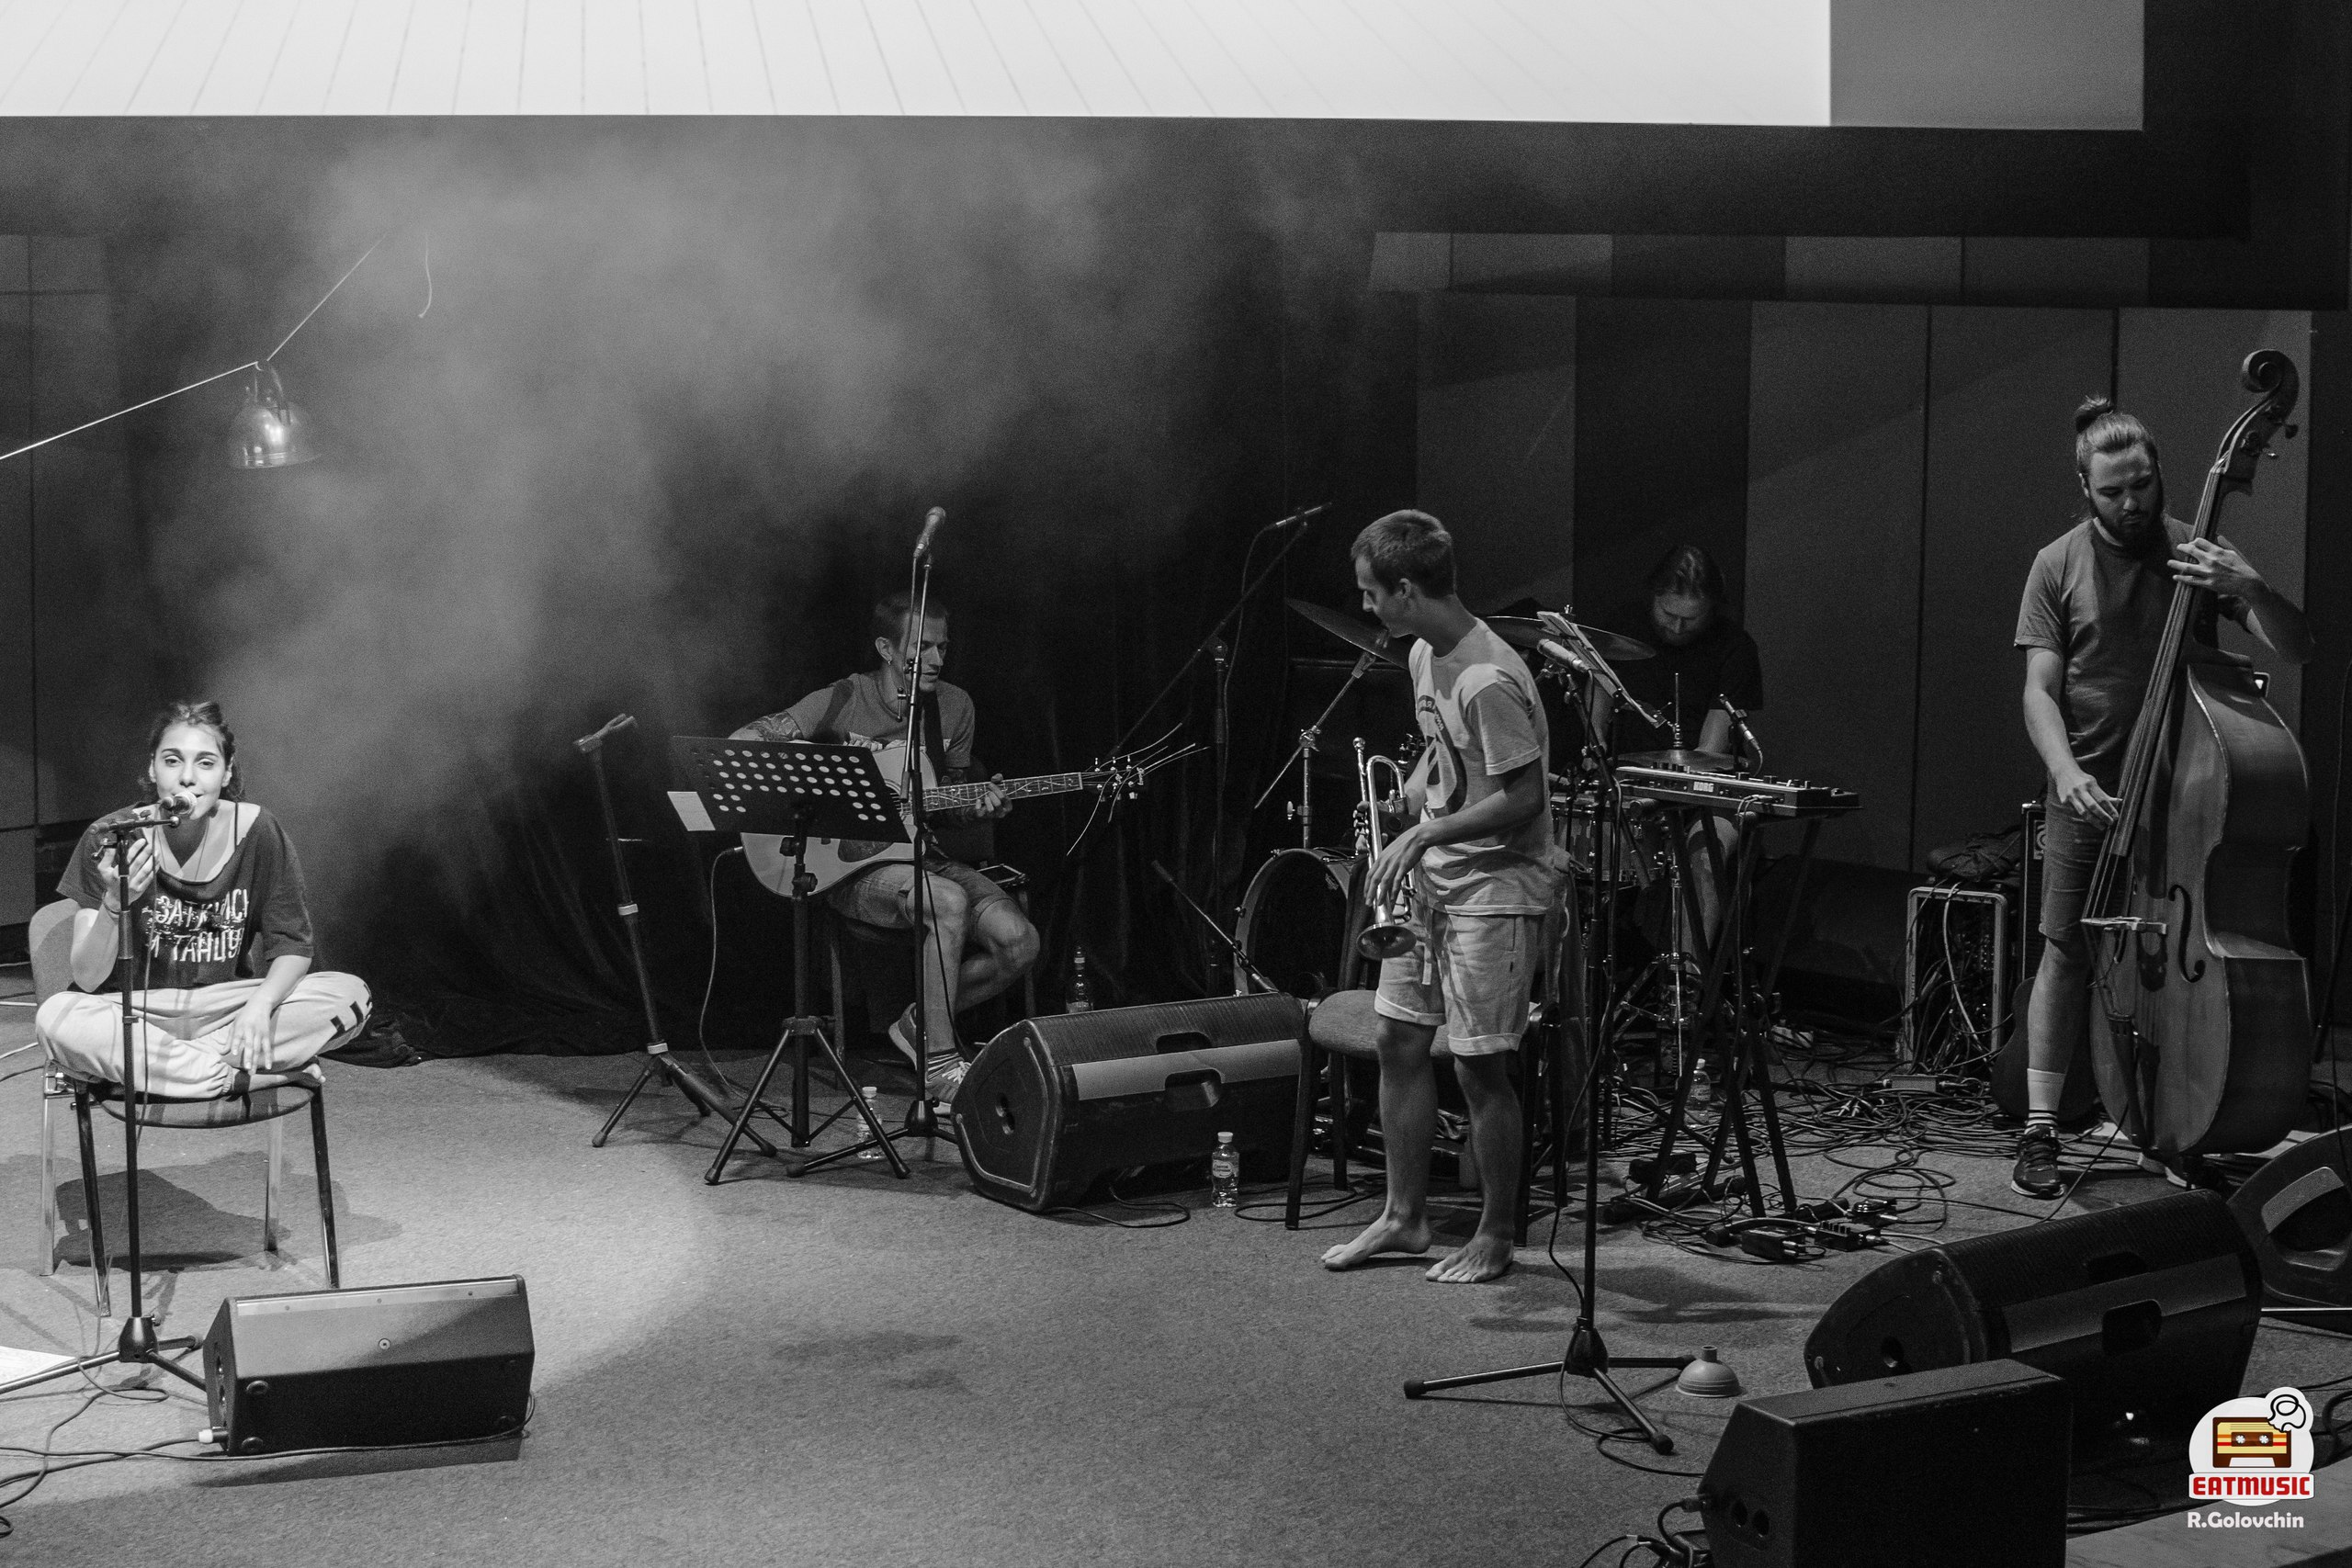 Акустическая программа АлоэВера в ЦДХ 27.05.17: репортаж, фото Роман Головчин